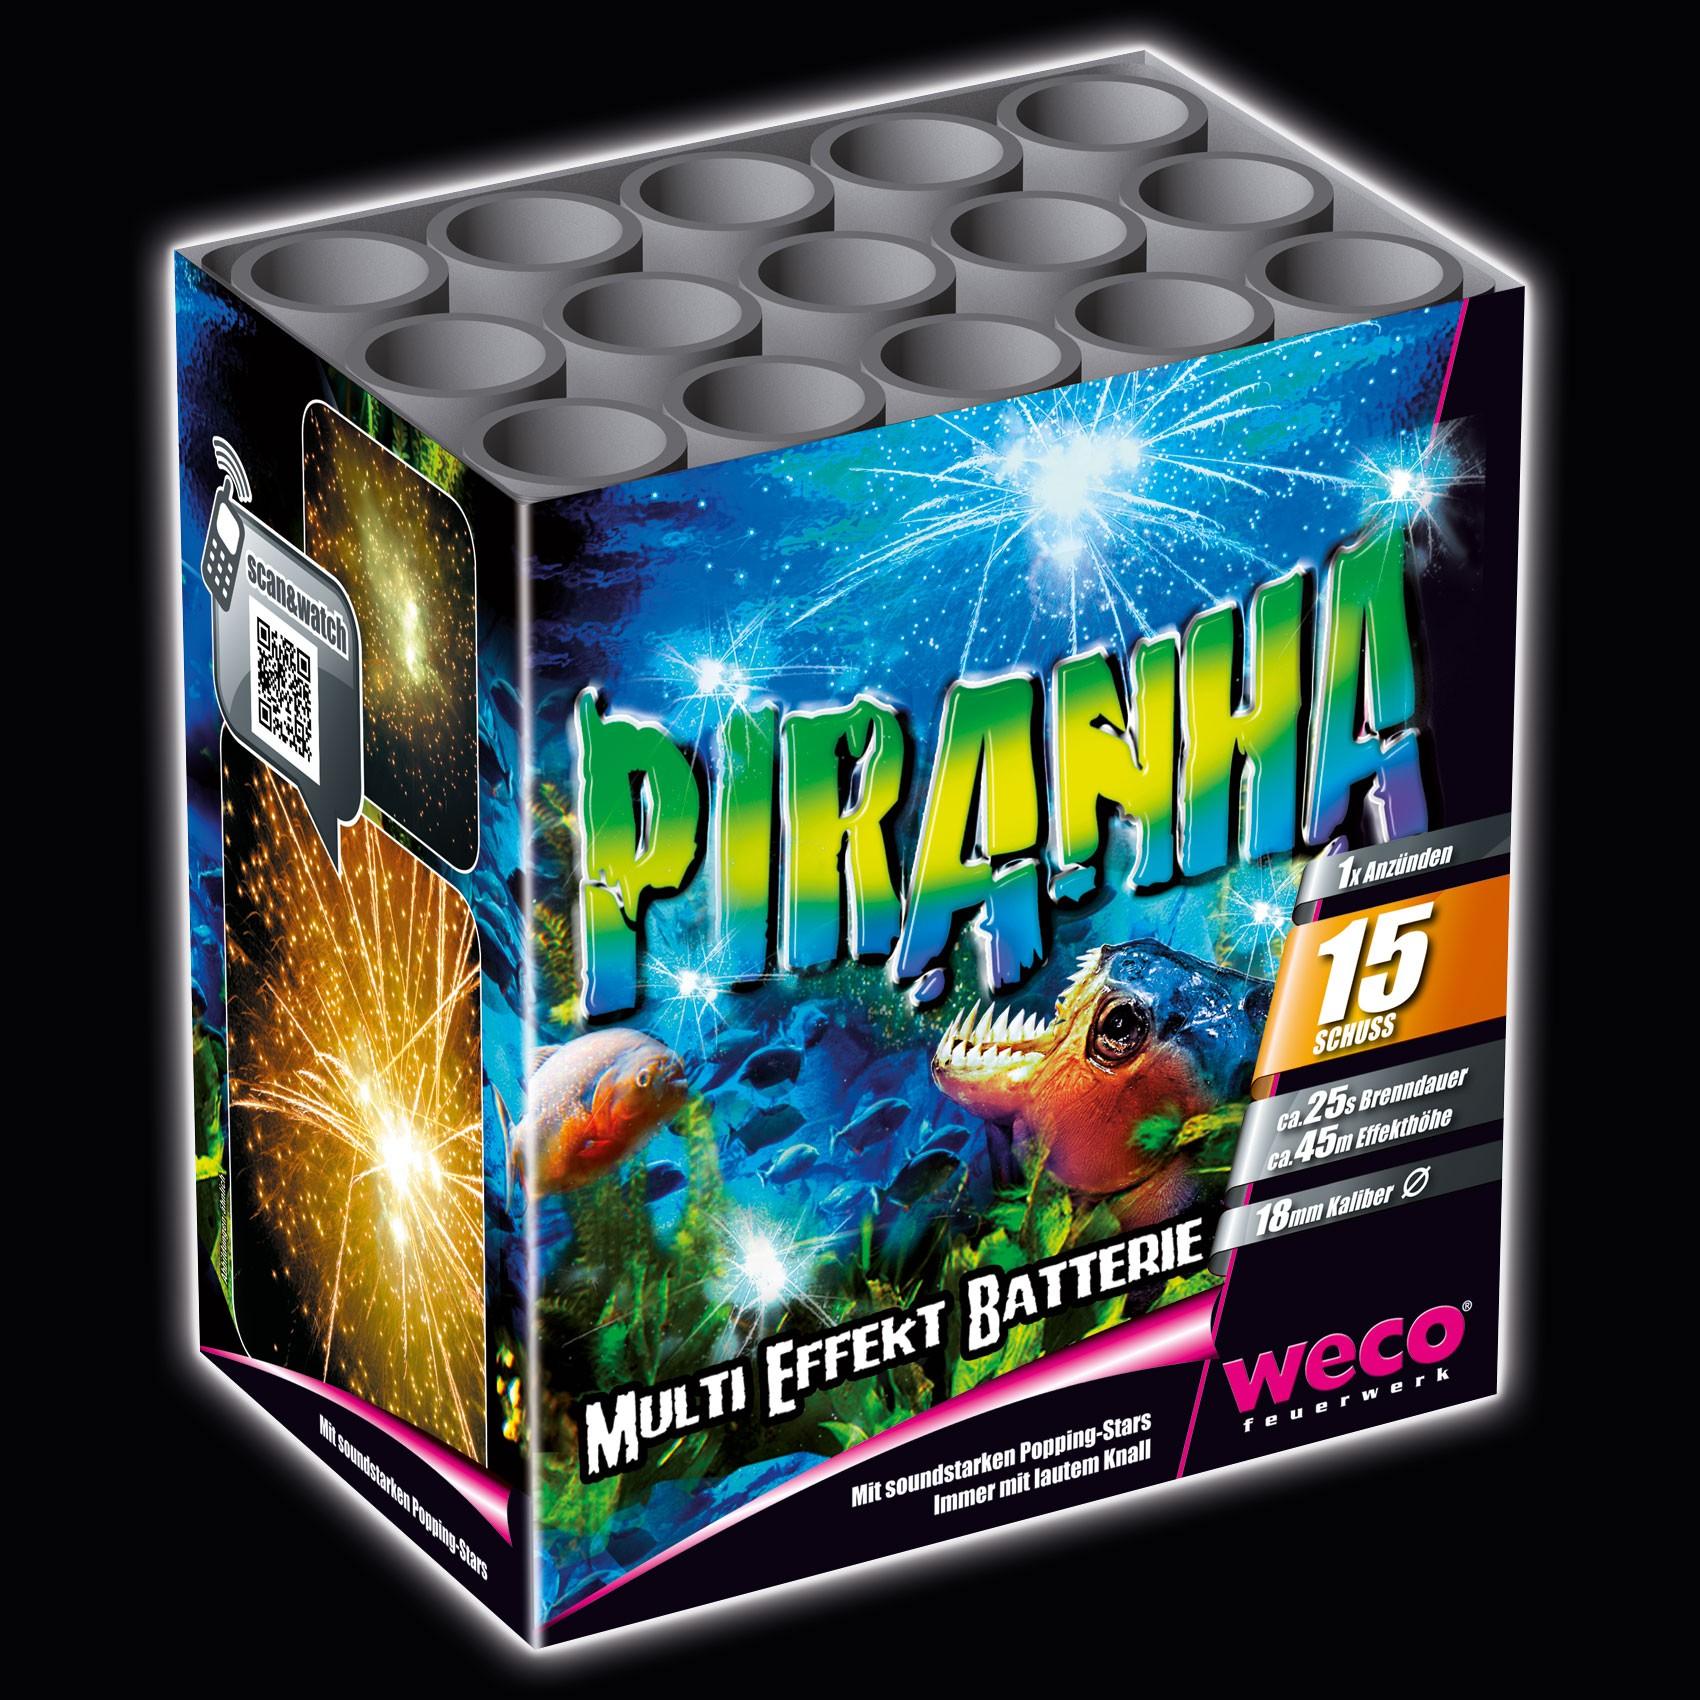 Weco Piranha / Aligator